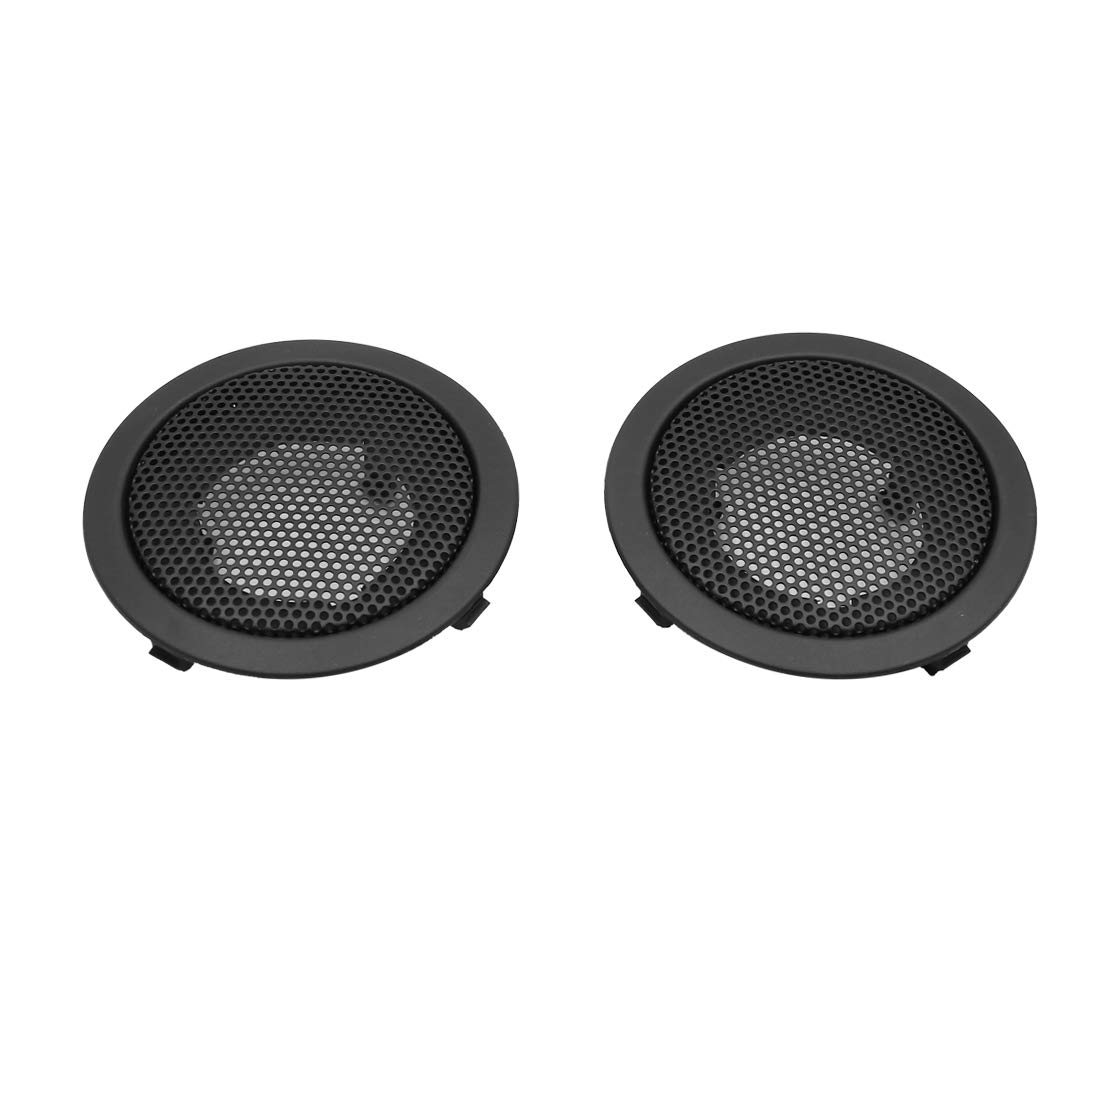 uxcell Pair Black Car Speaker Trim Cover Tweeter Protector for 2009-2013 Toyota RAV4